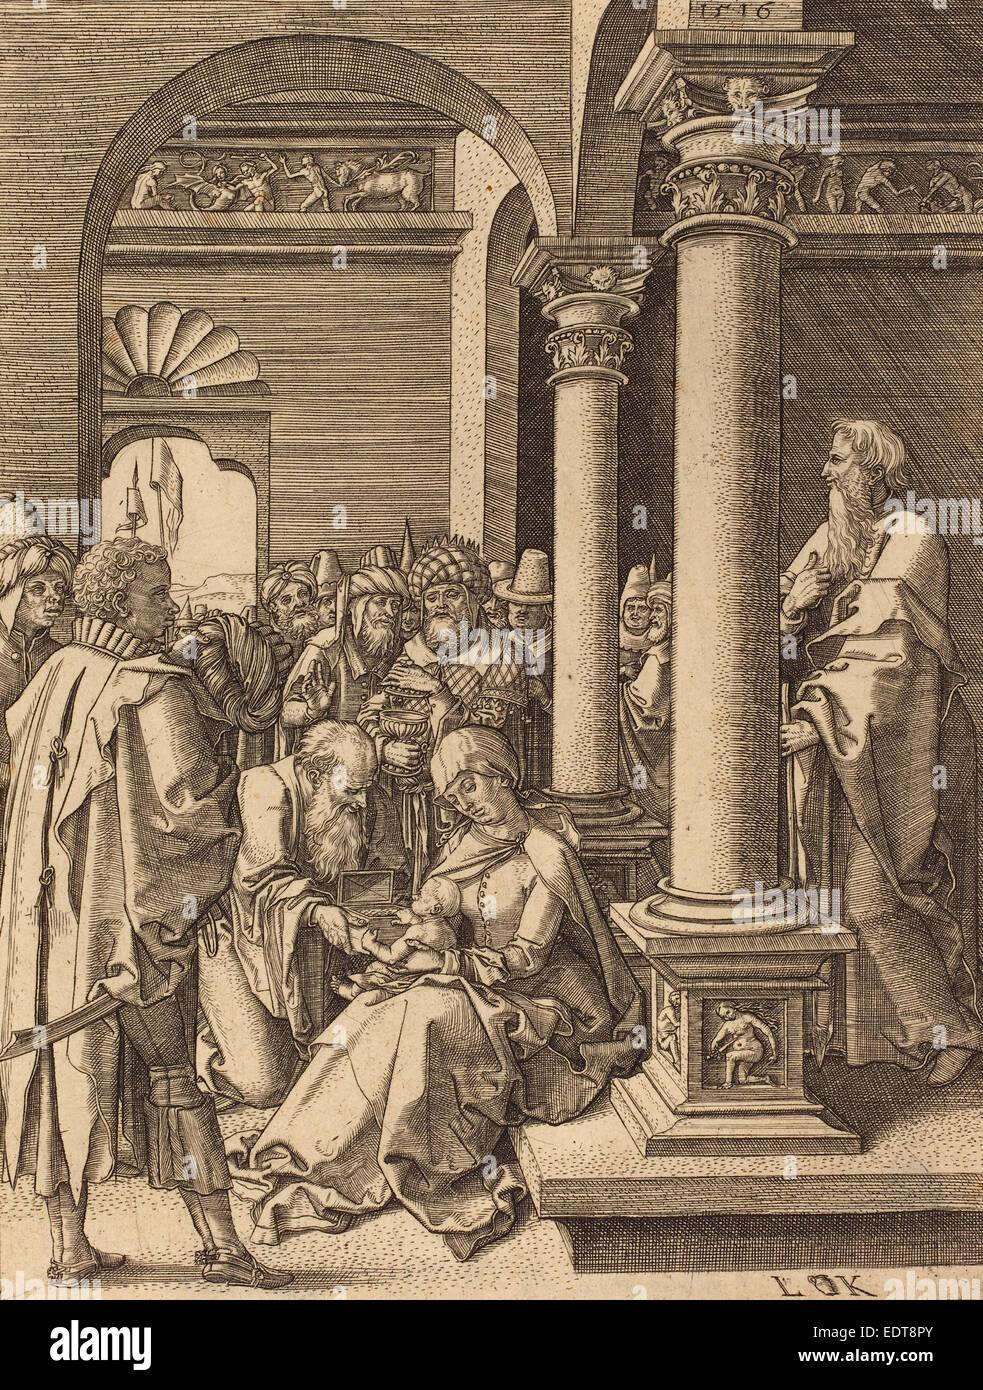 Ludwig Krug (German, c. 1488 - 1532), The Adoration of the Magi, engraving - Stock Image